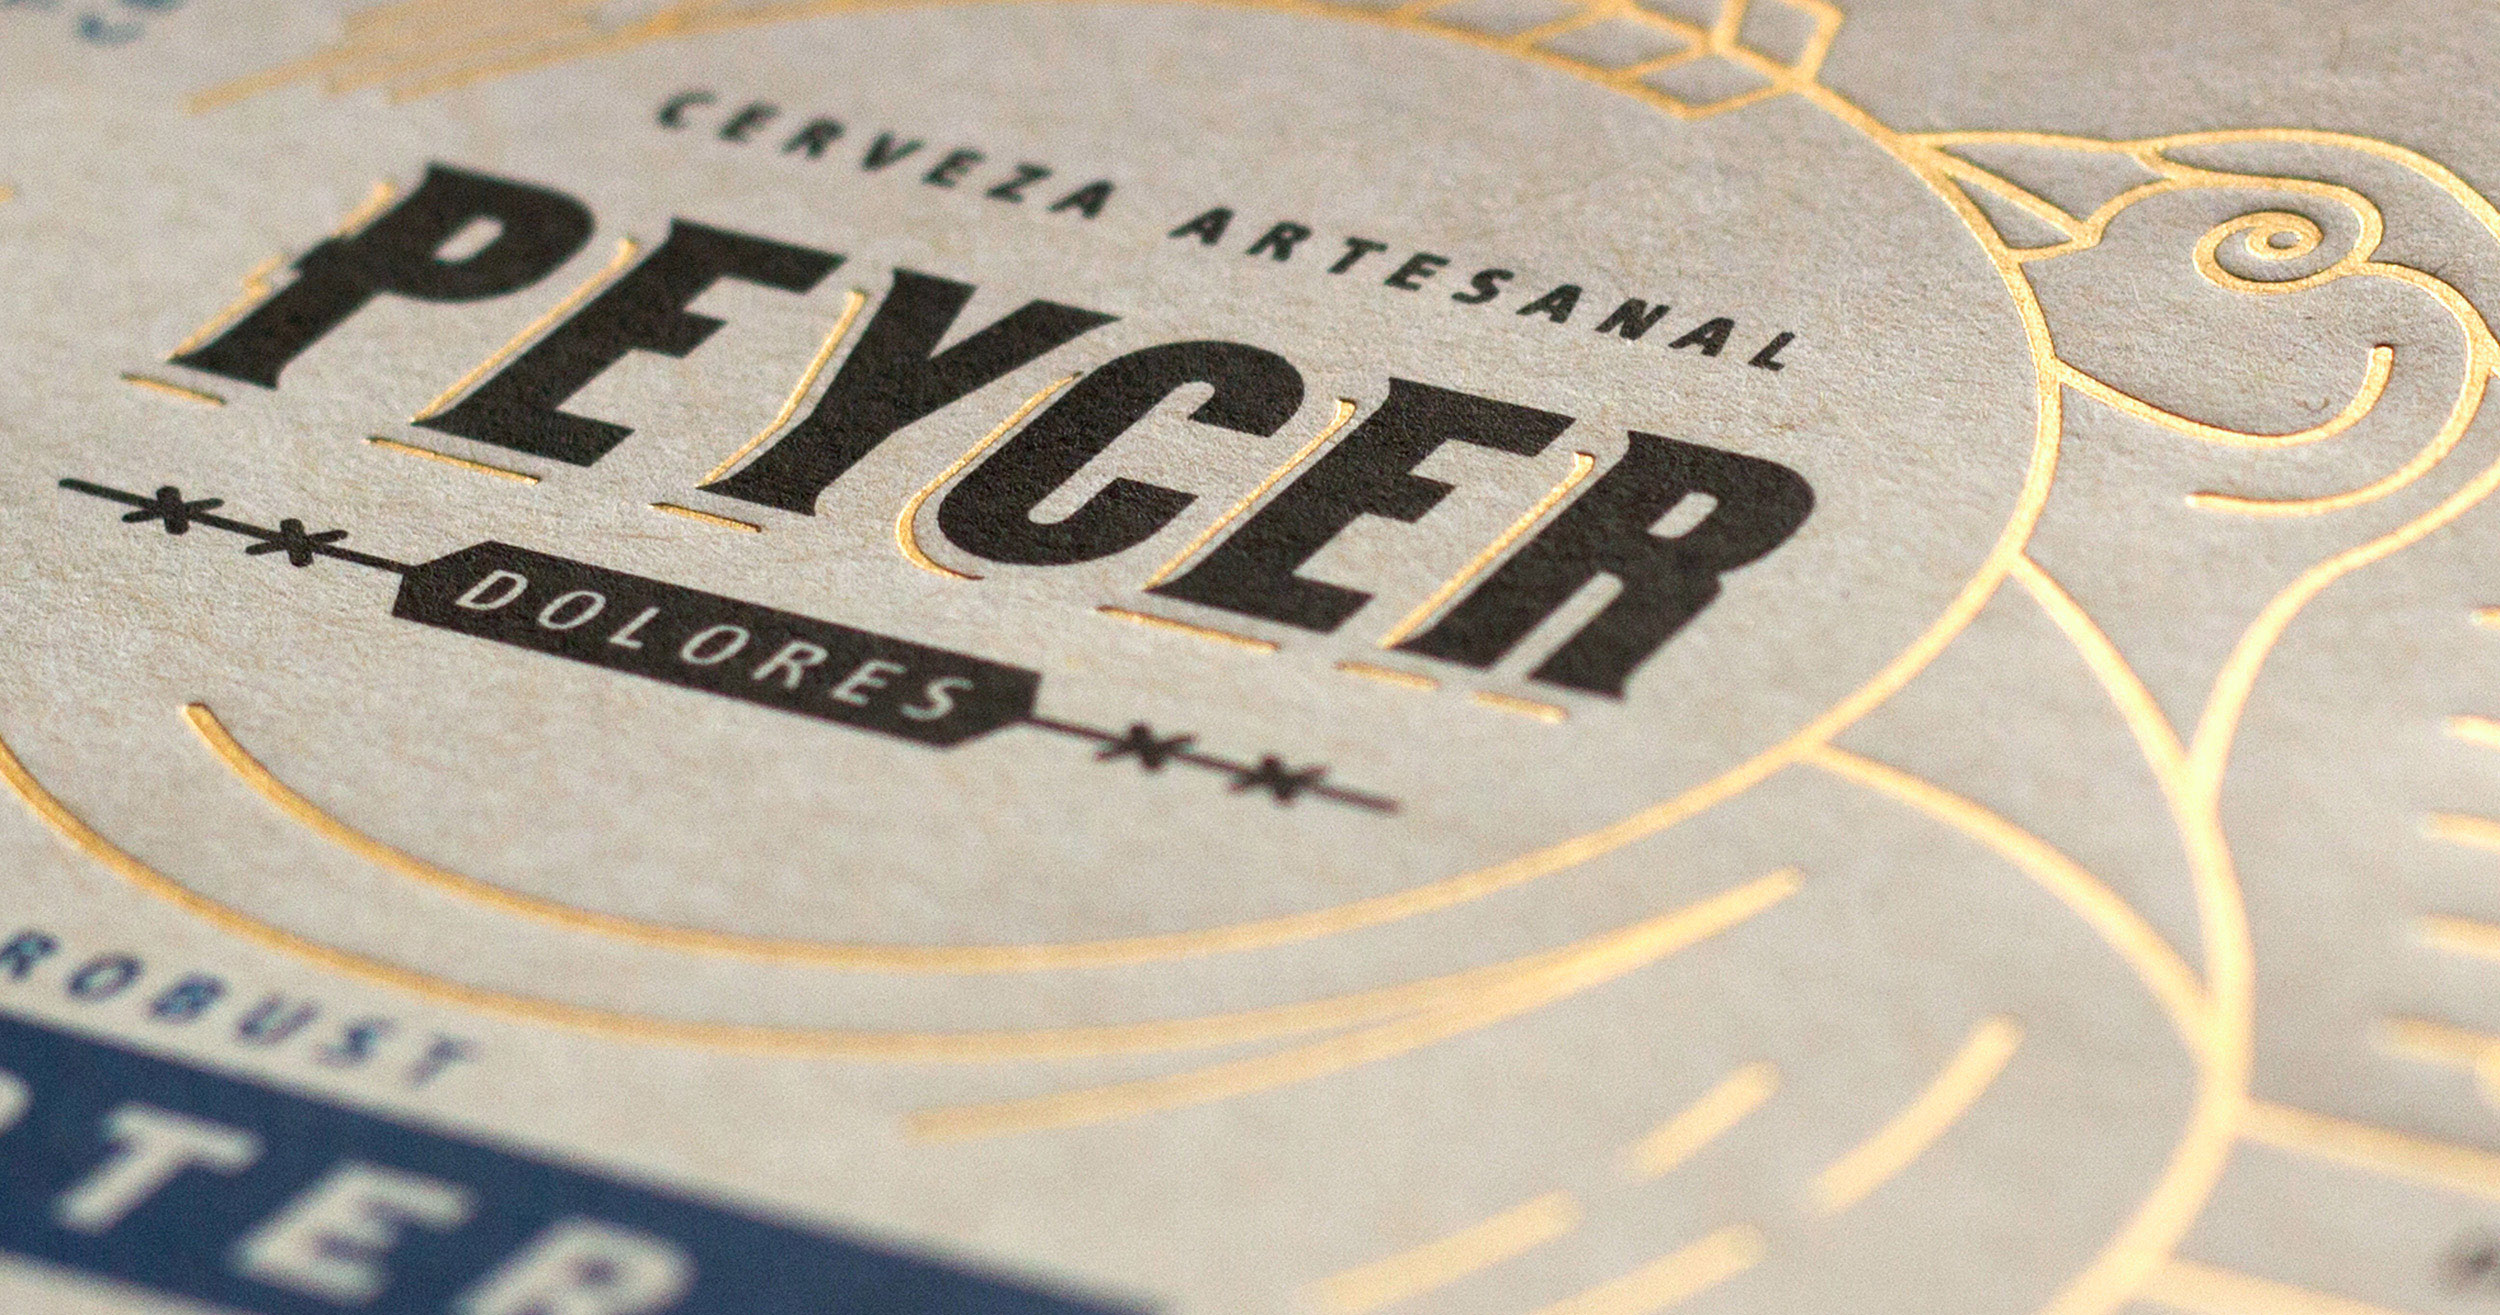 Matias Harina - Paycer Craft Beer6.jpg